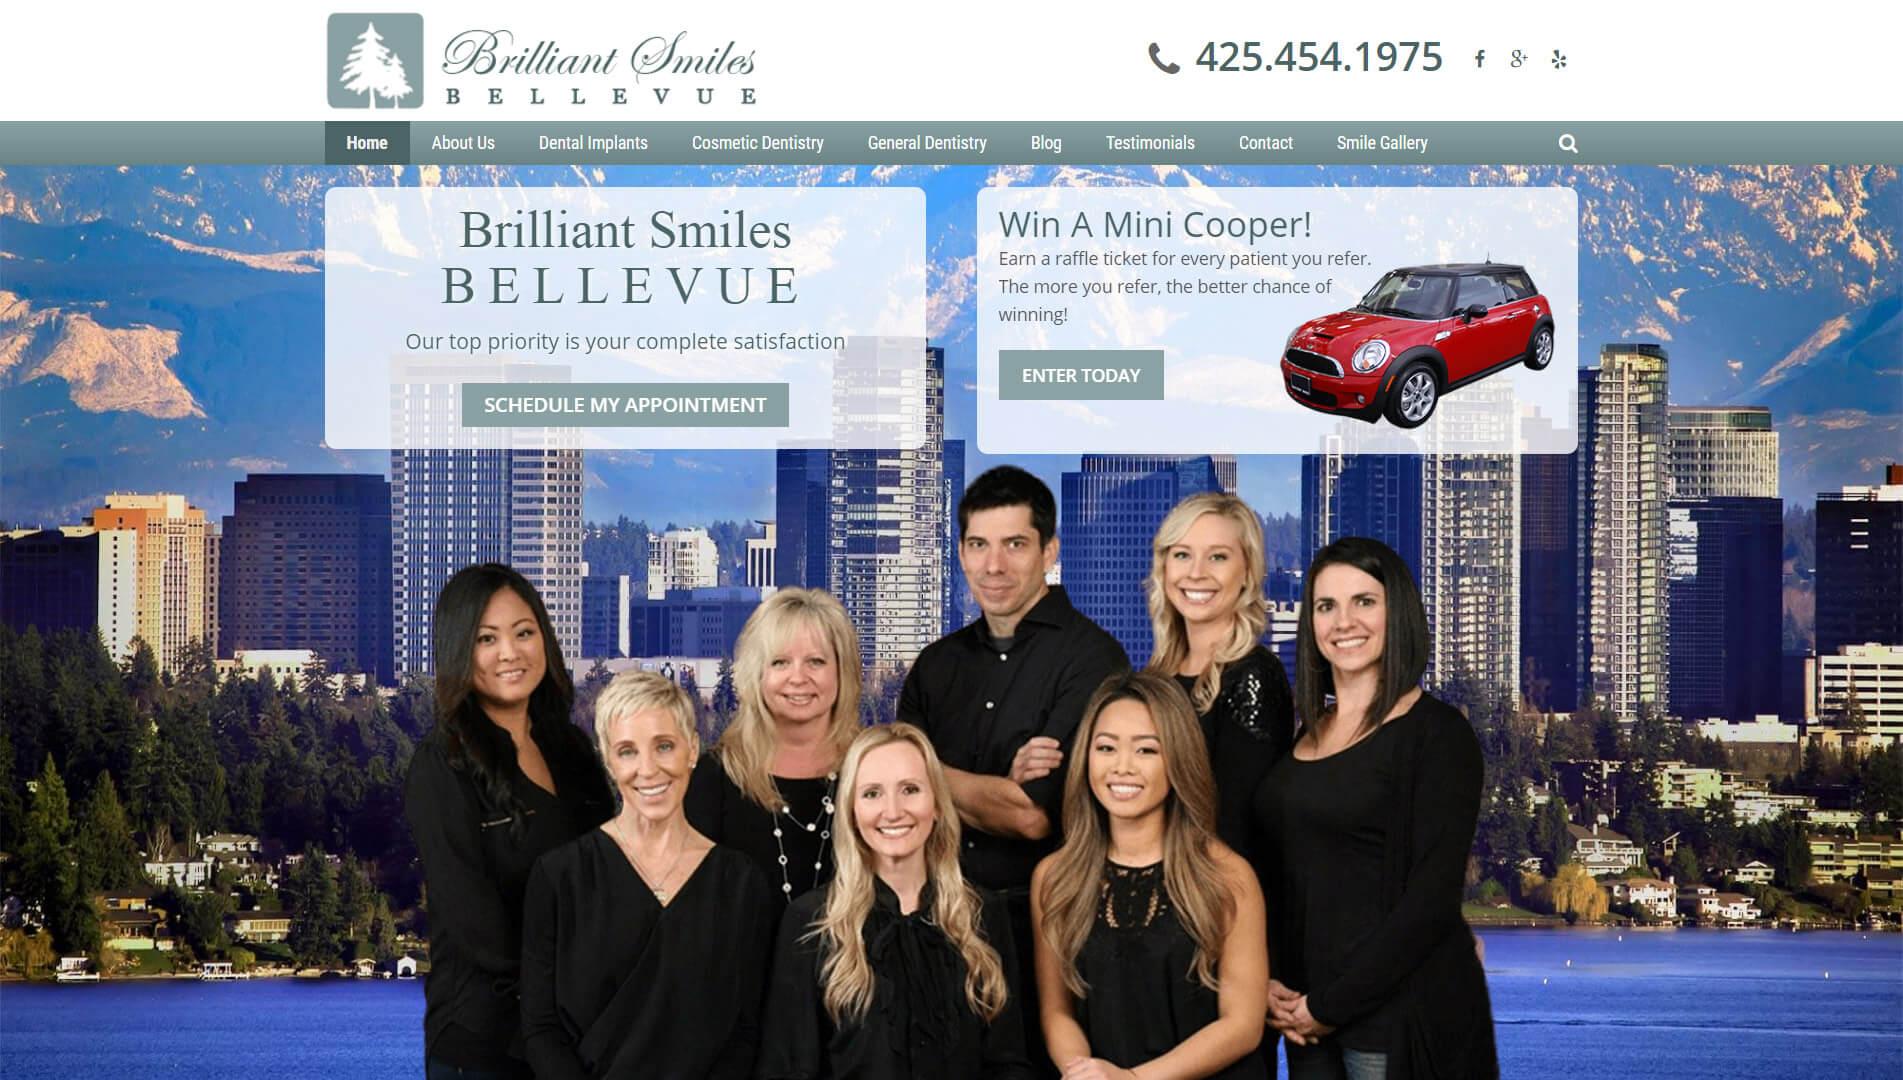 Bellevue Home Page Screenshot